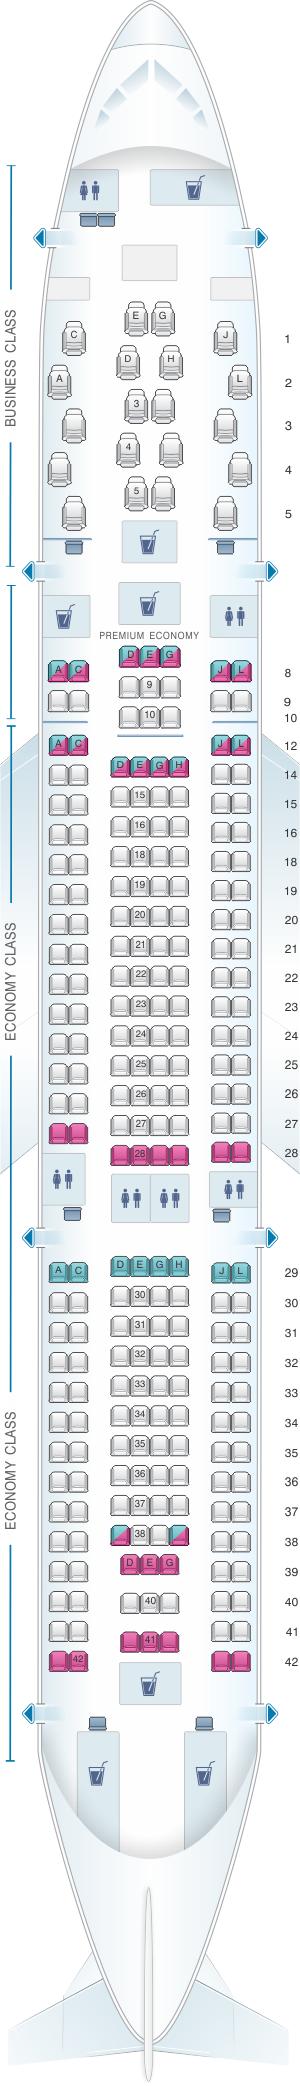 Seat Map Alitalia Airlines Air One Airbus A330 200 Air